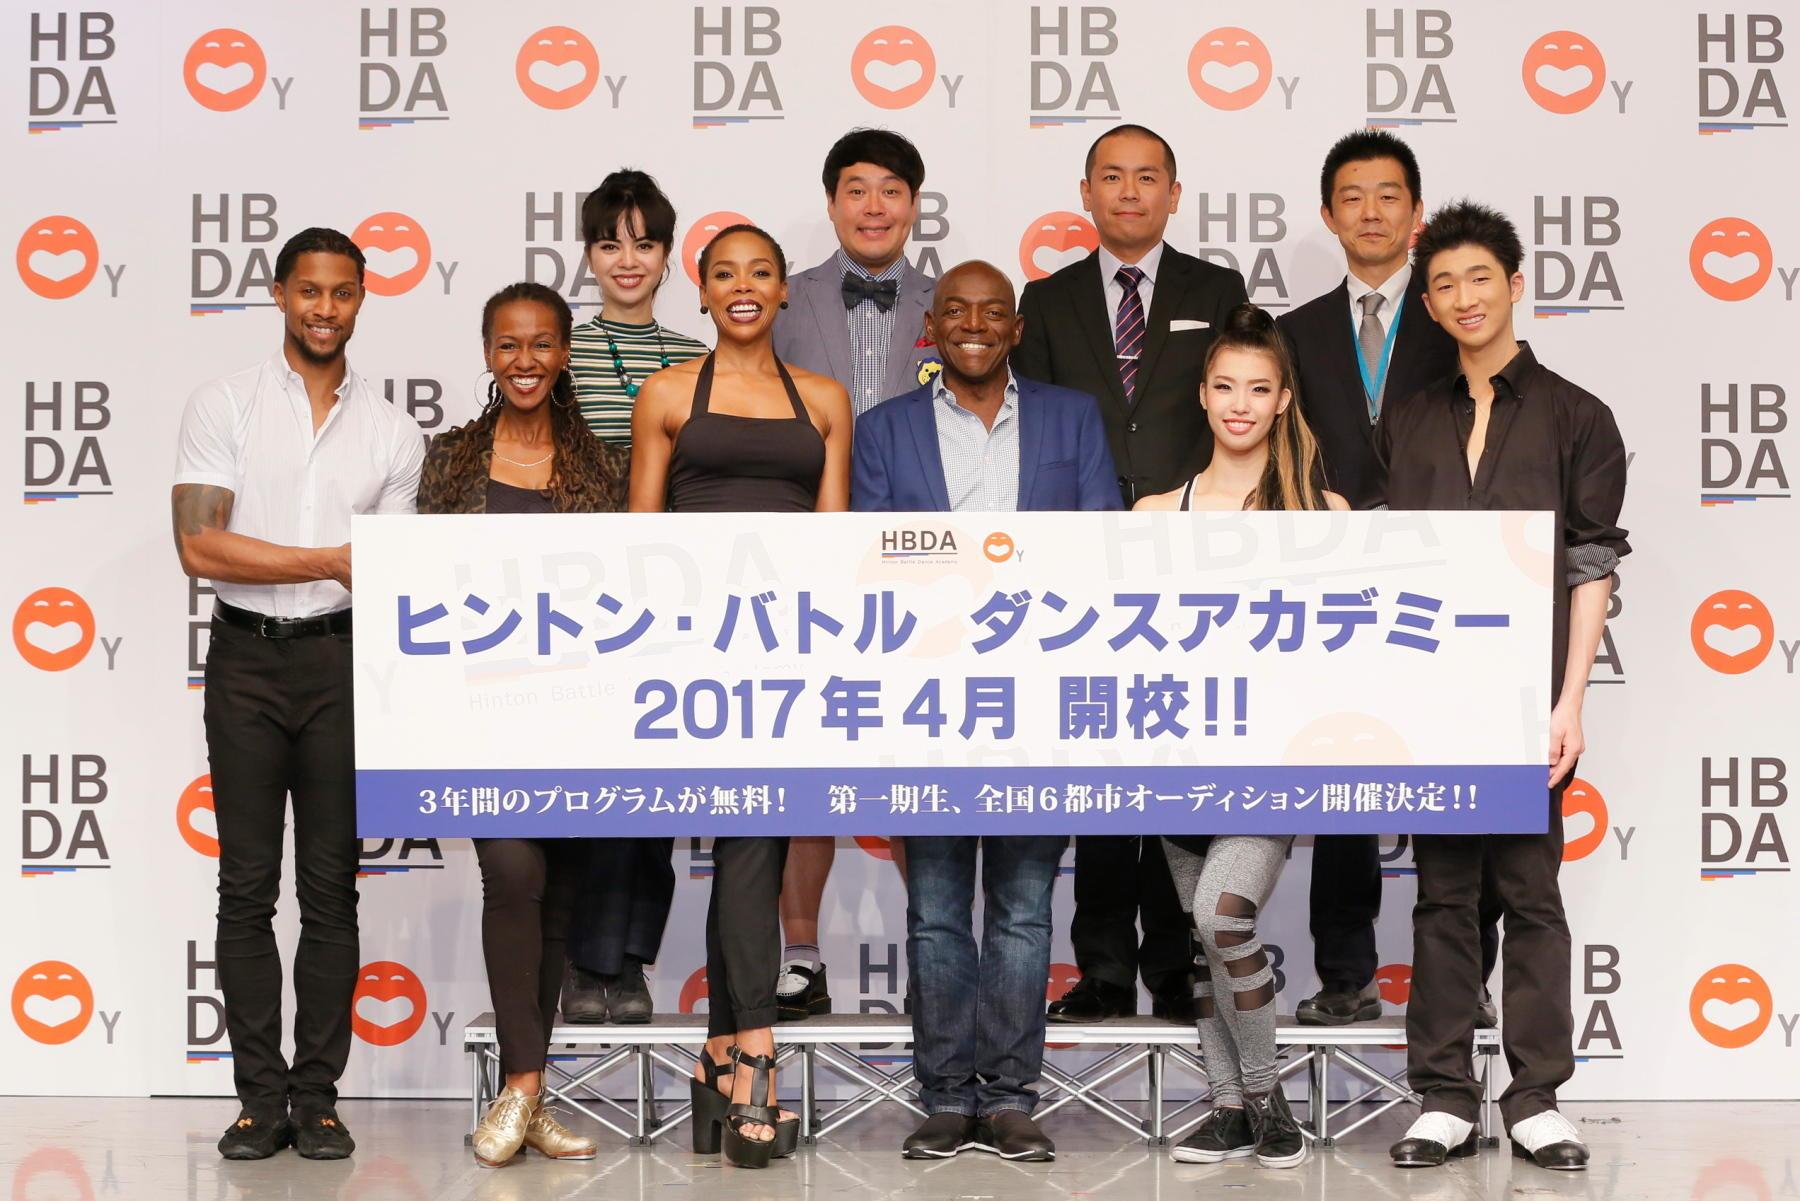 http://news.yoshimoto.co.jp/20161018175801-c92bf1794c1741fe9aec5b8a3ba5f13ef2b9936e.jpg